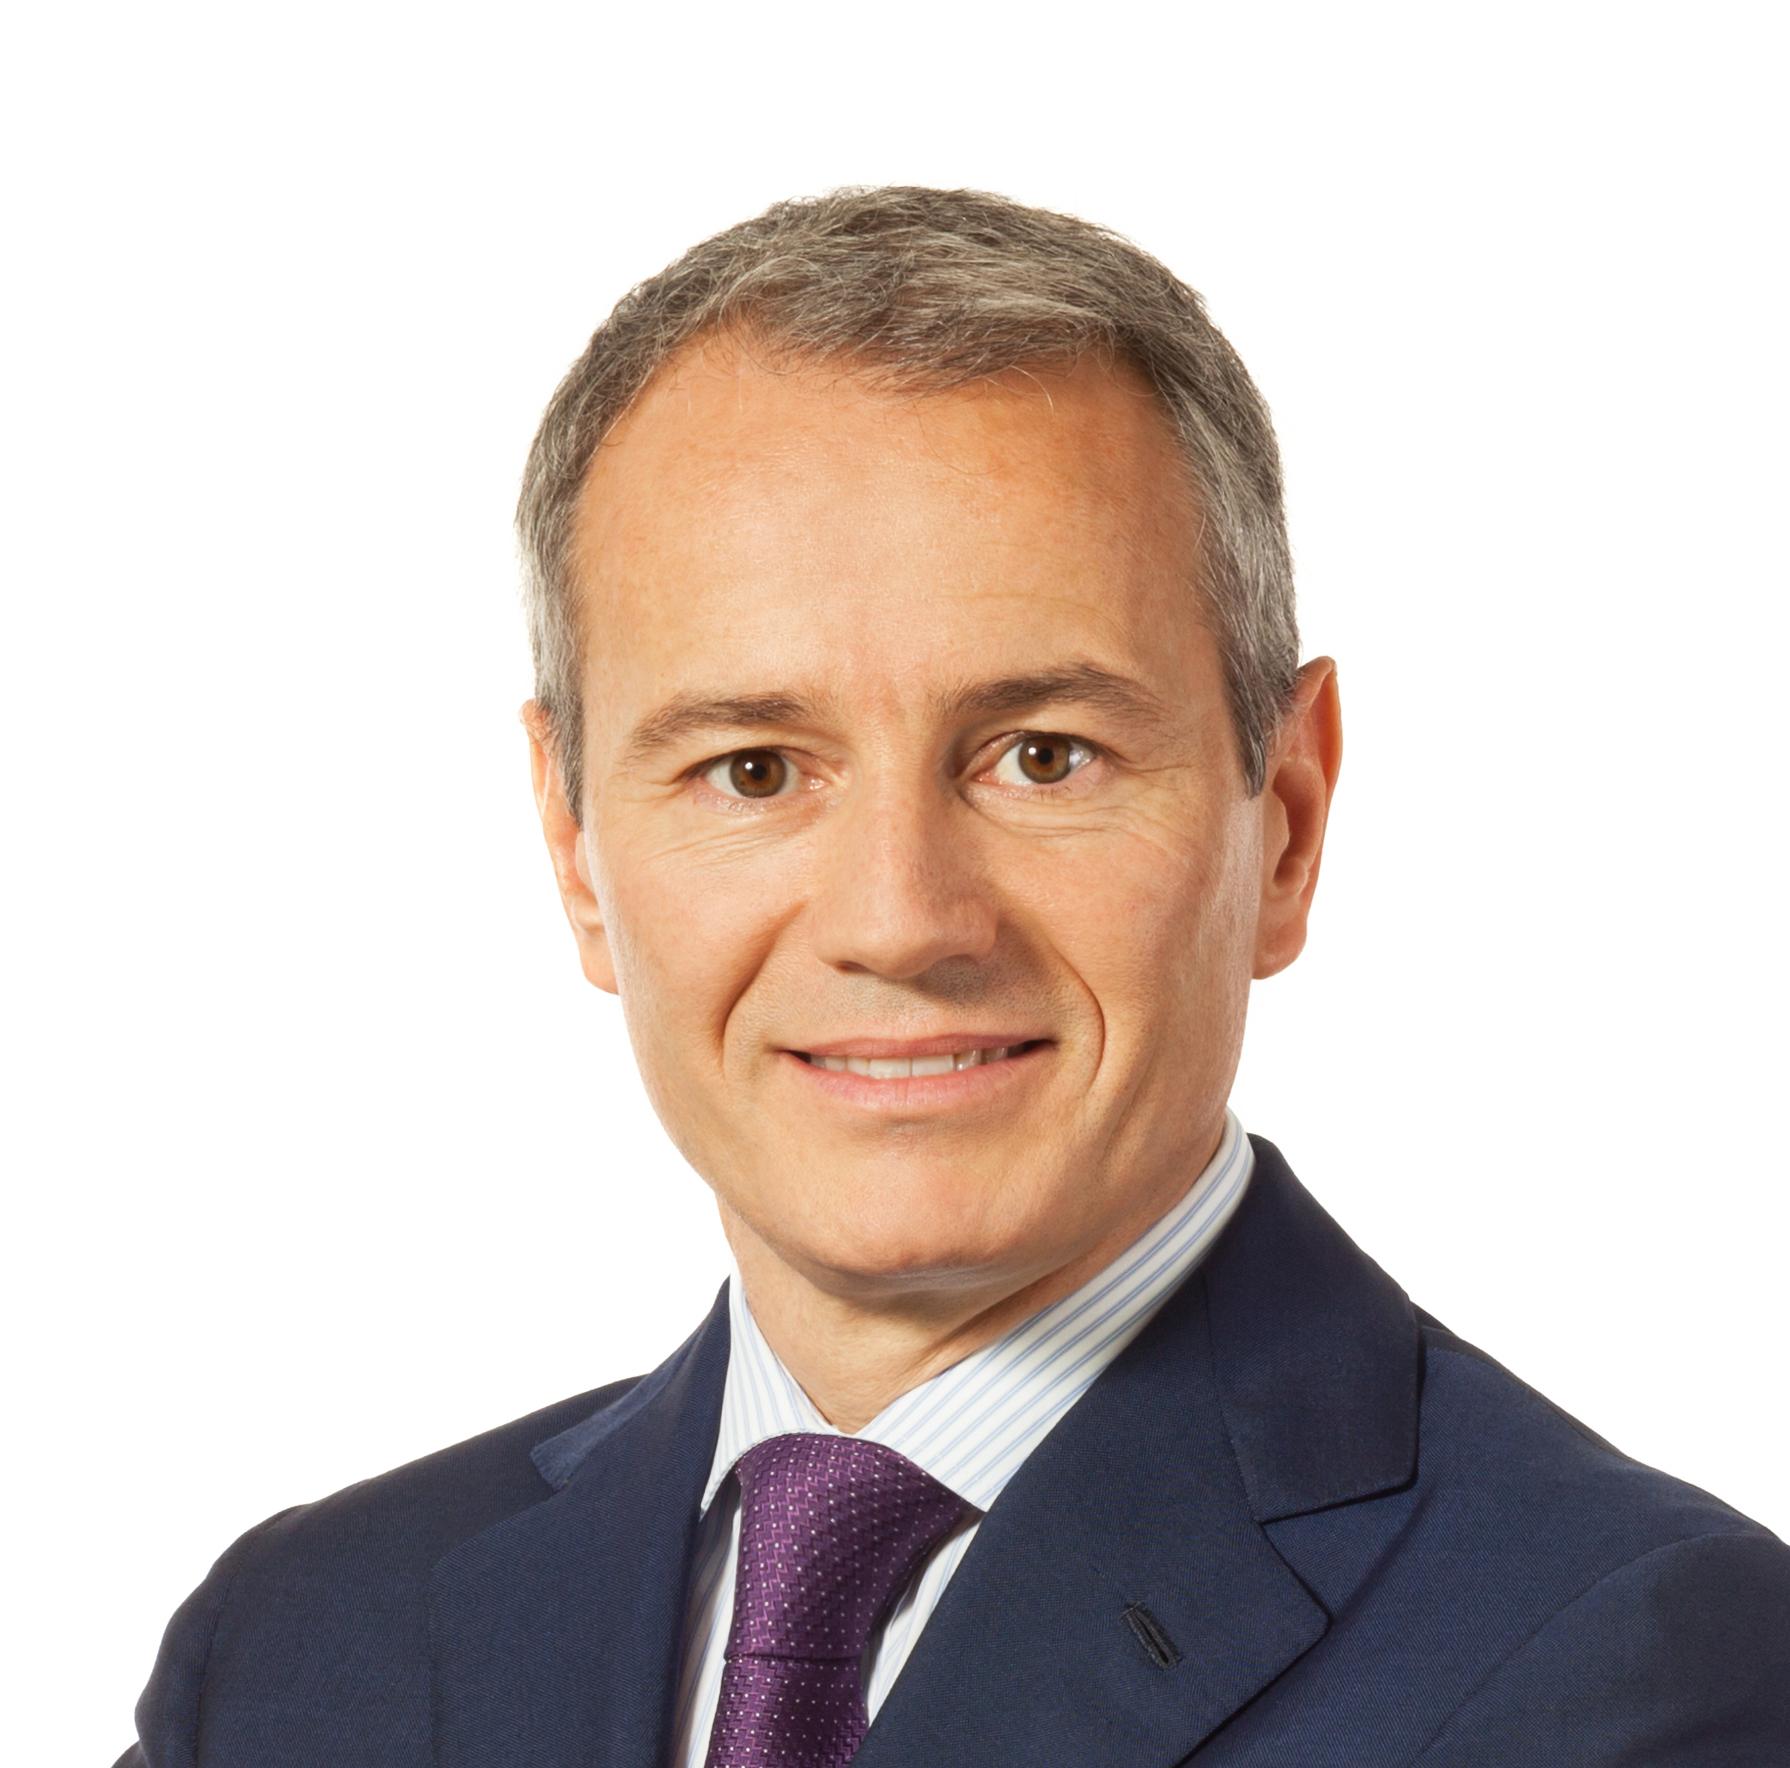 Gian-Luca Lardi